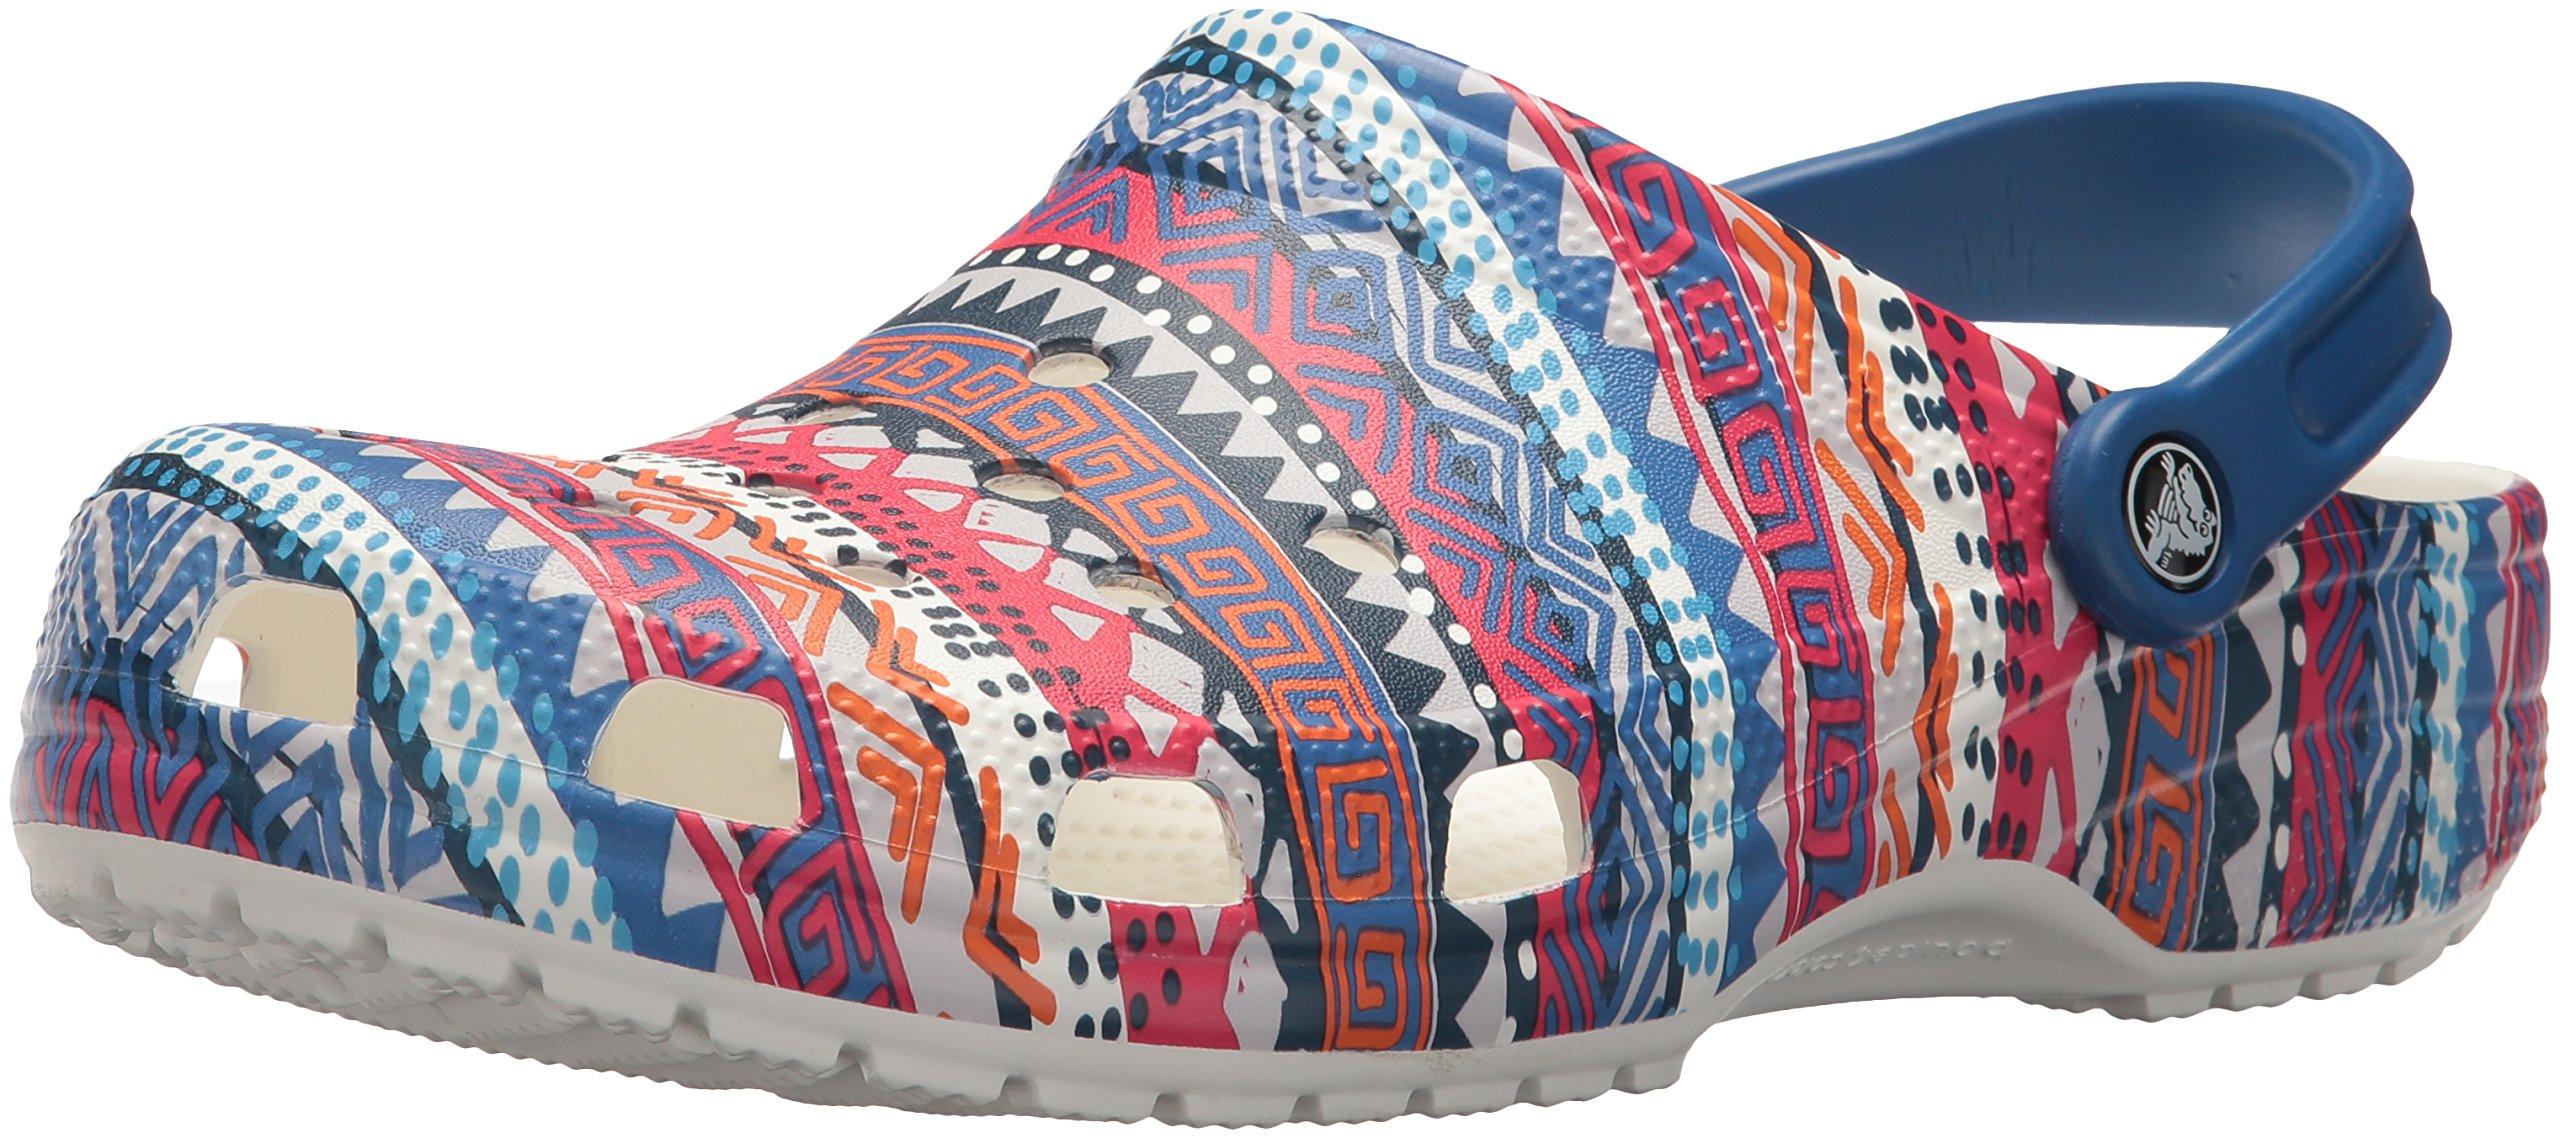 Crocs Unisex Classic Printed Clog Mule, Blue Jean/White, 12 US Men/14 US Women